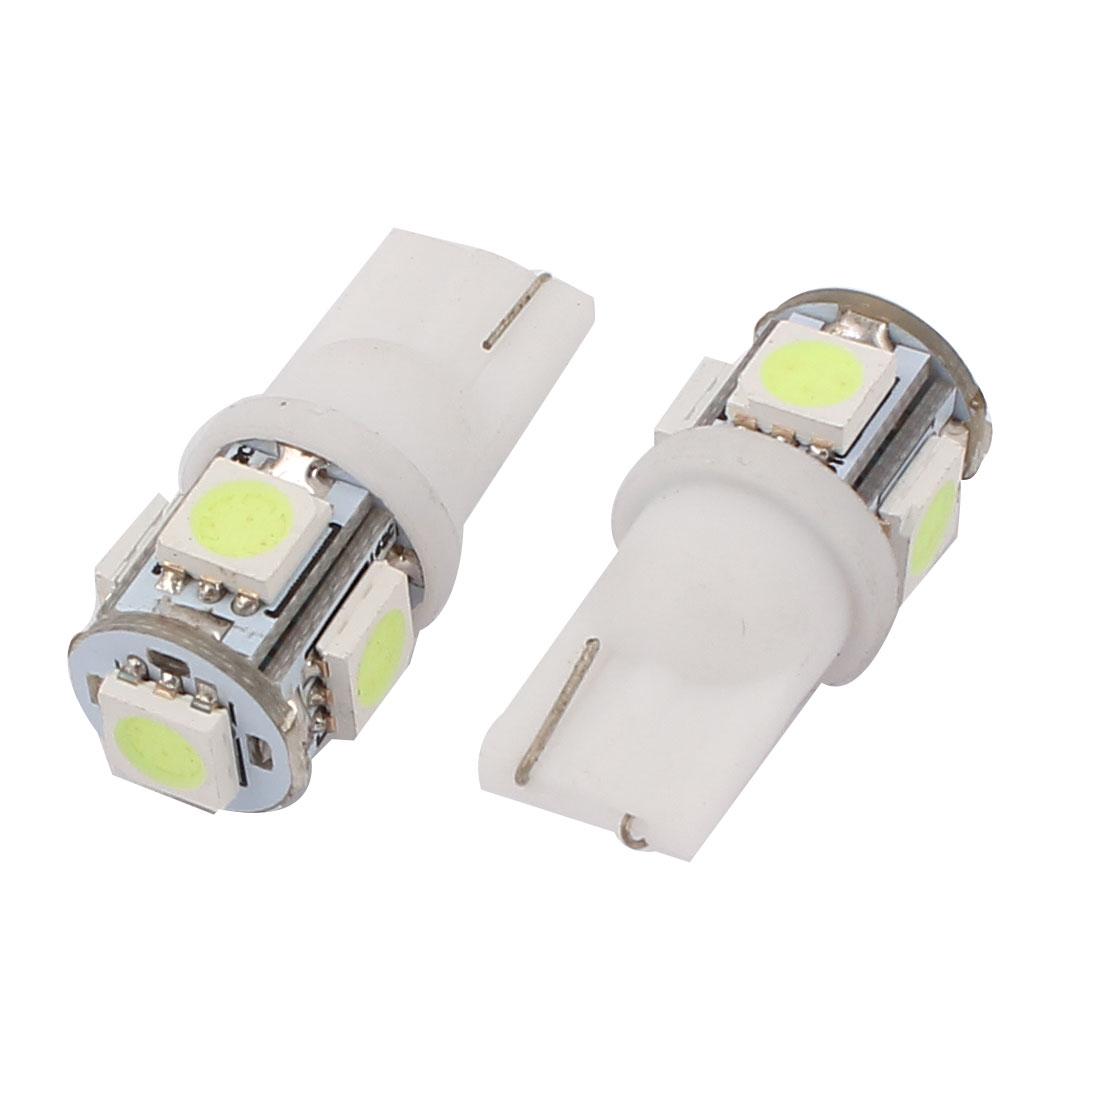 2 Pcs 12V T10 LED Cool White Car Side Wedge Light Dashboard Instrument Lamp Bulb Interior